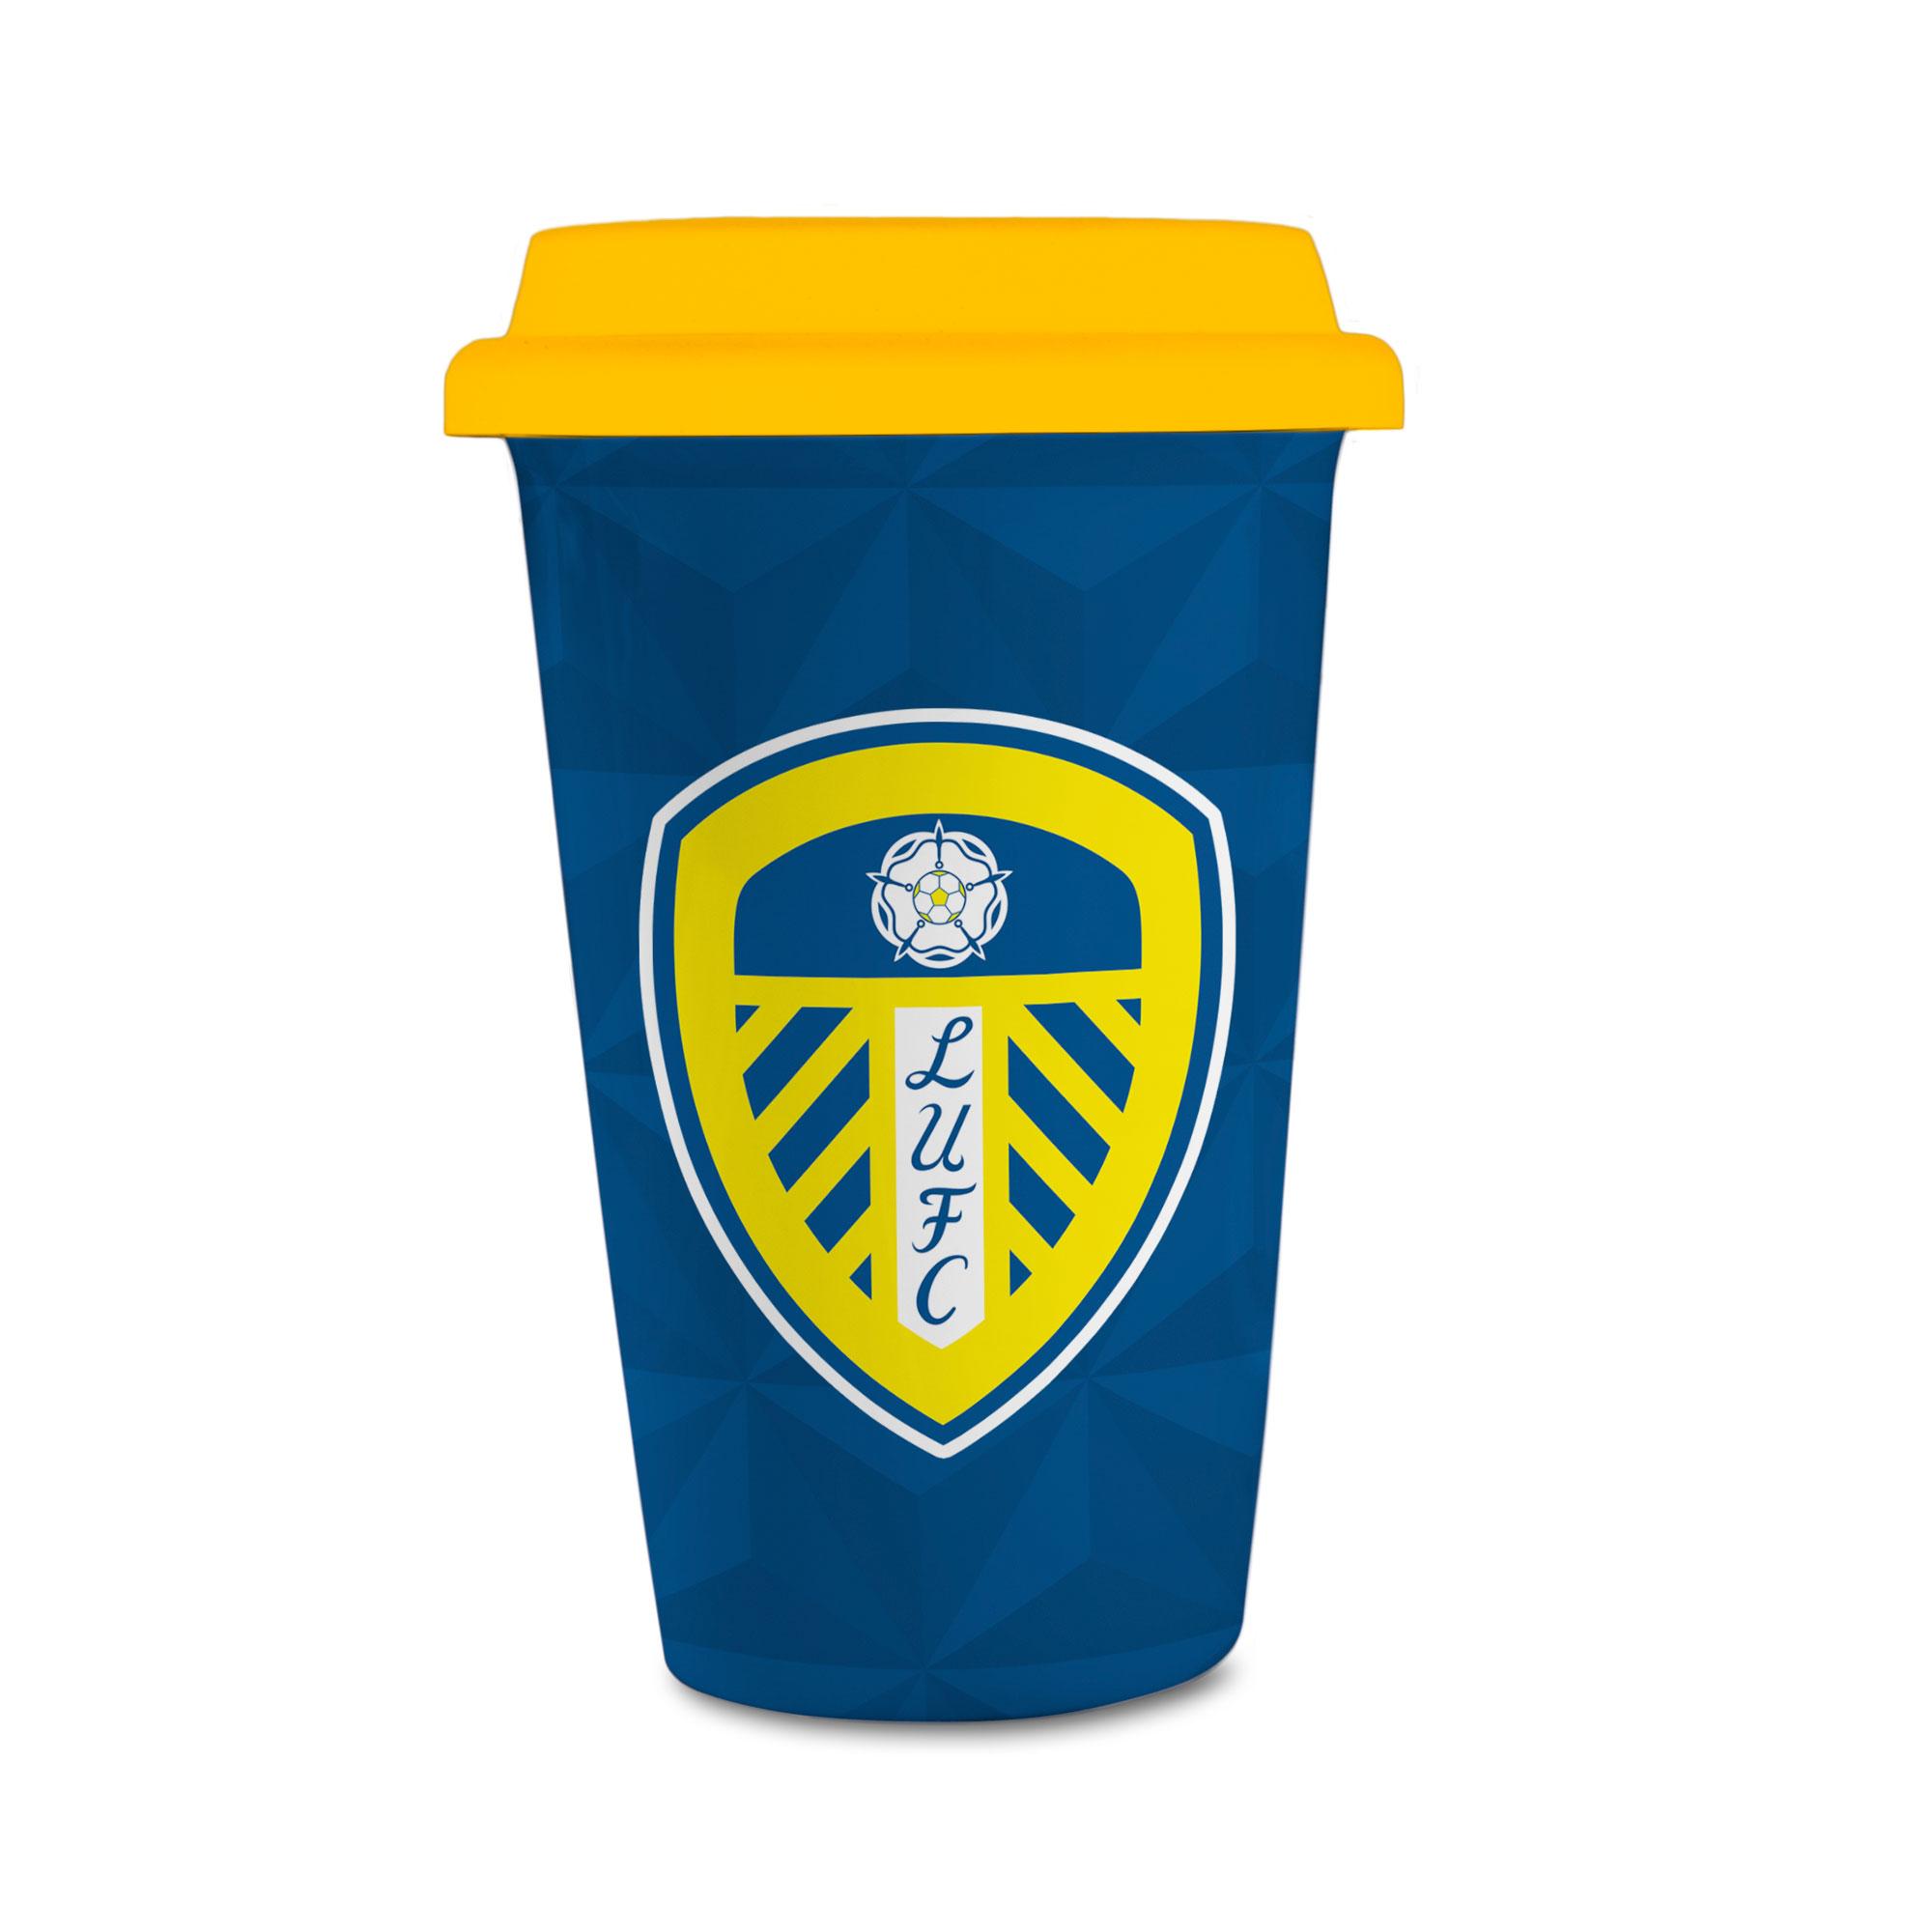 Leeds United FC Crest Reusable Cup